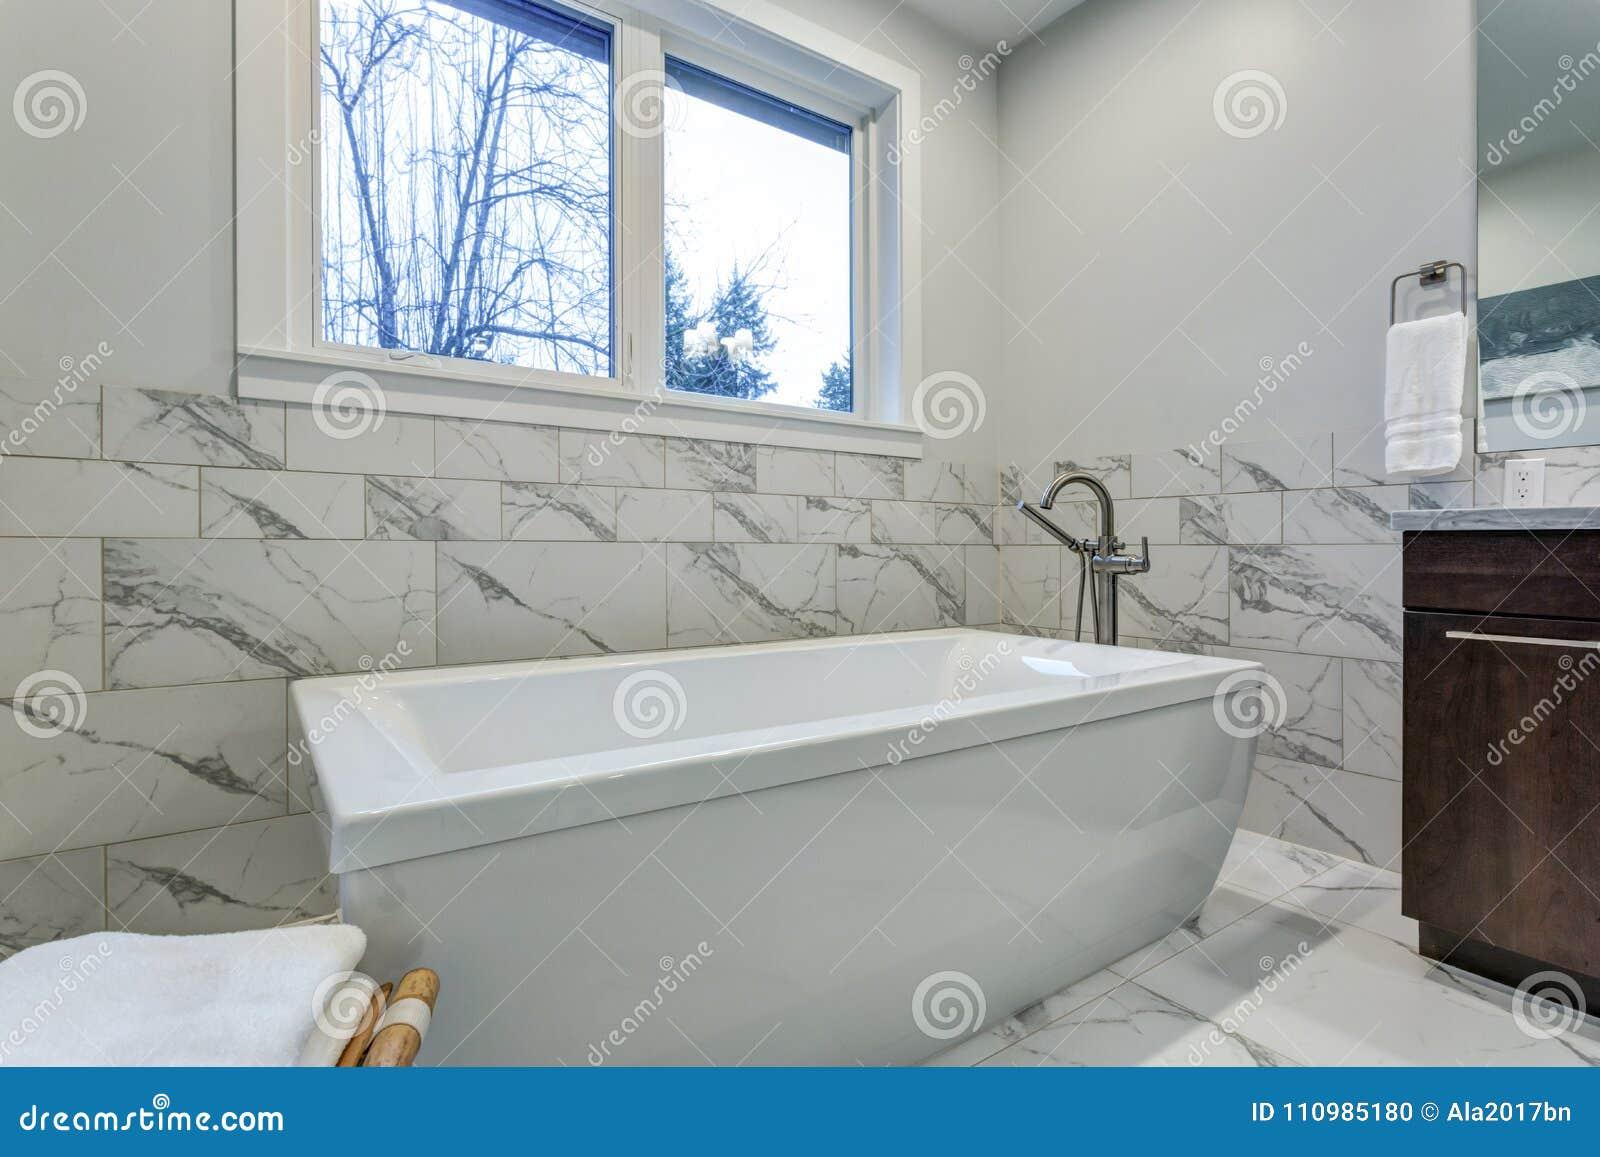 Incredible Master Bathroom With Carrara Marble Tile Surround Stock